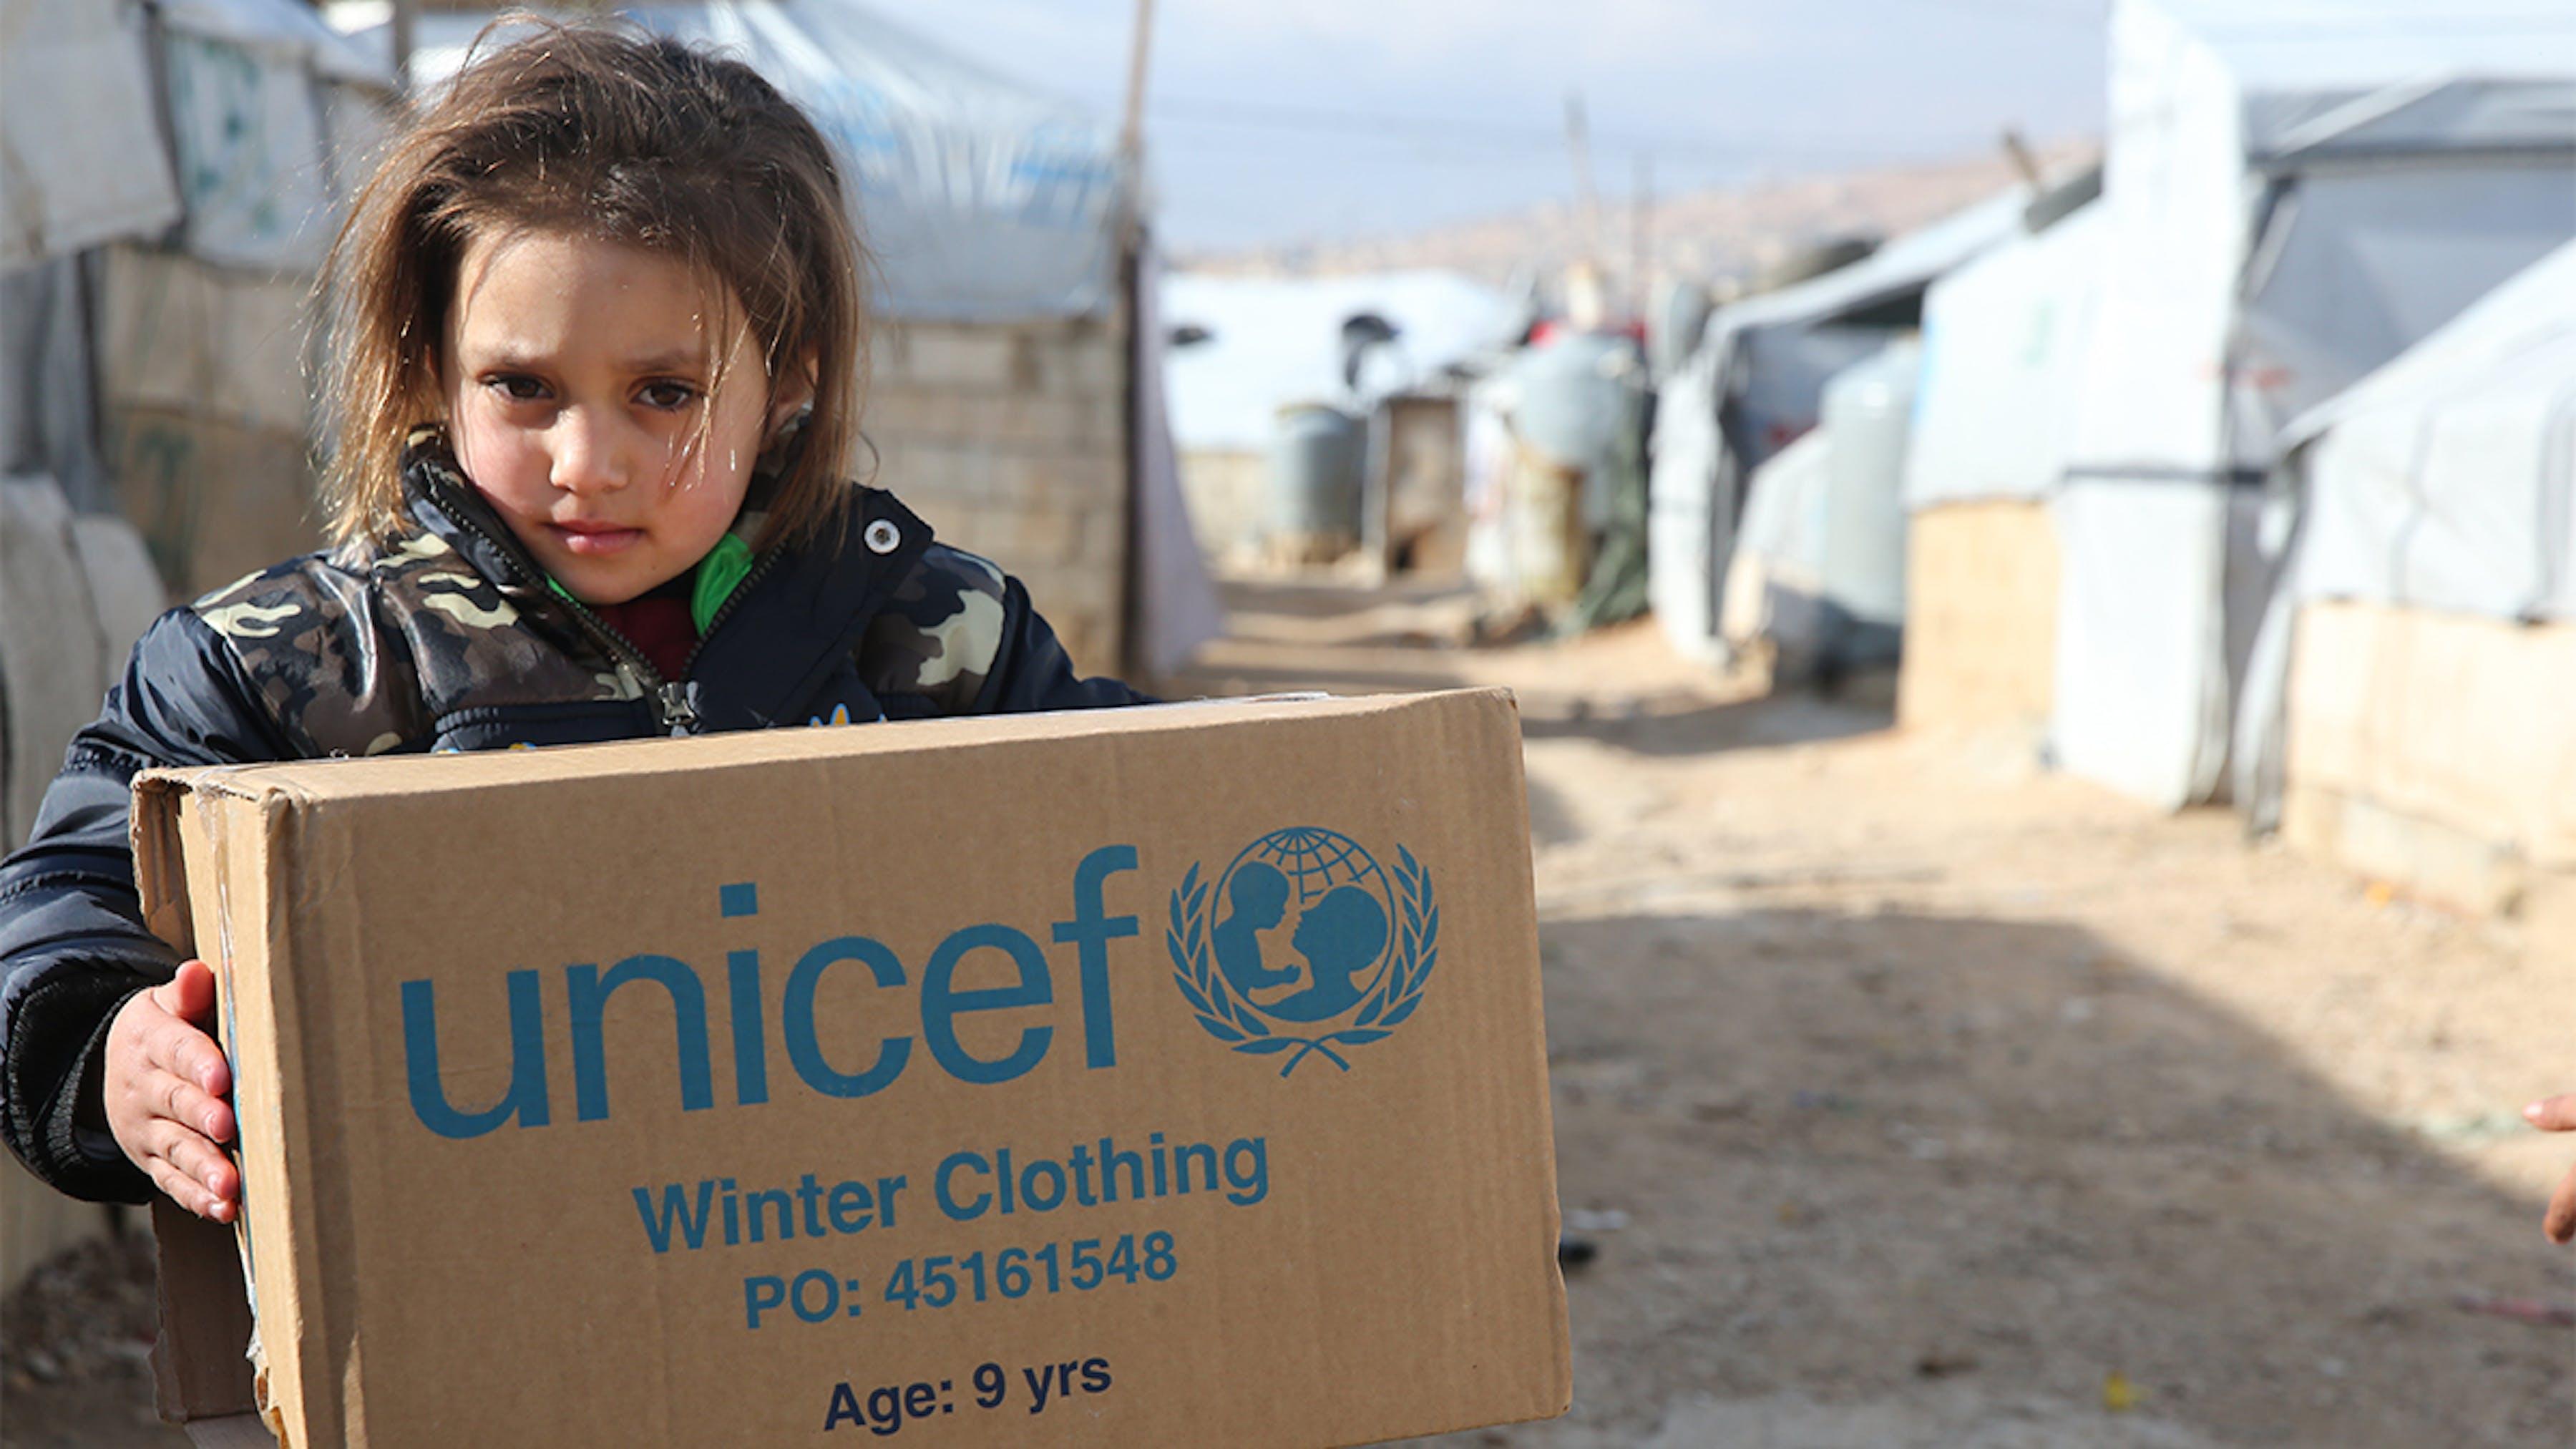 Libano, una bambina rifugiata siriana riceve aiuti per l'inverno